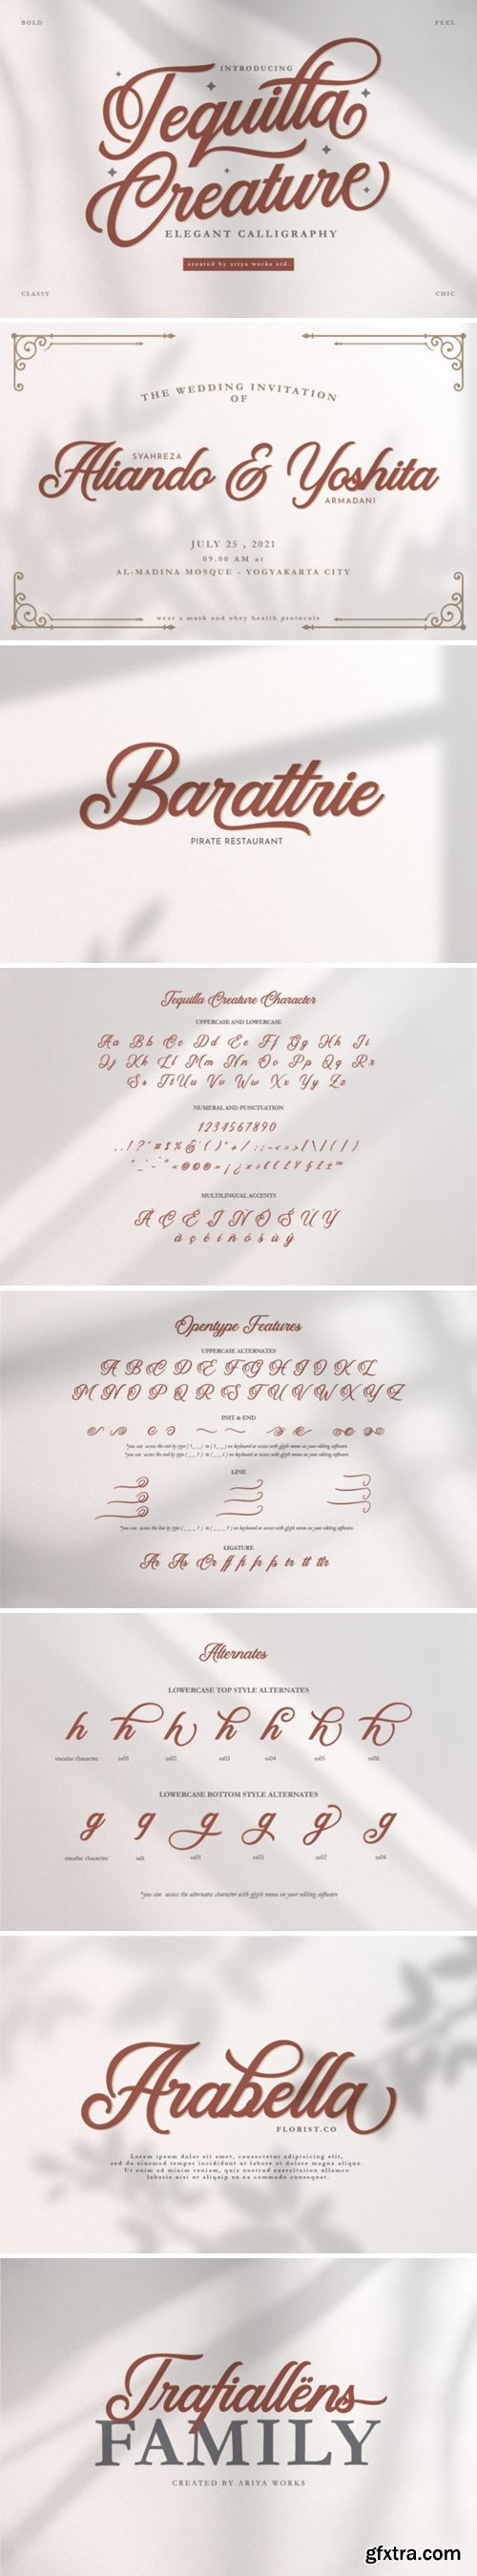 Tequilla Creature Font